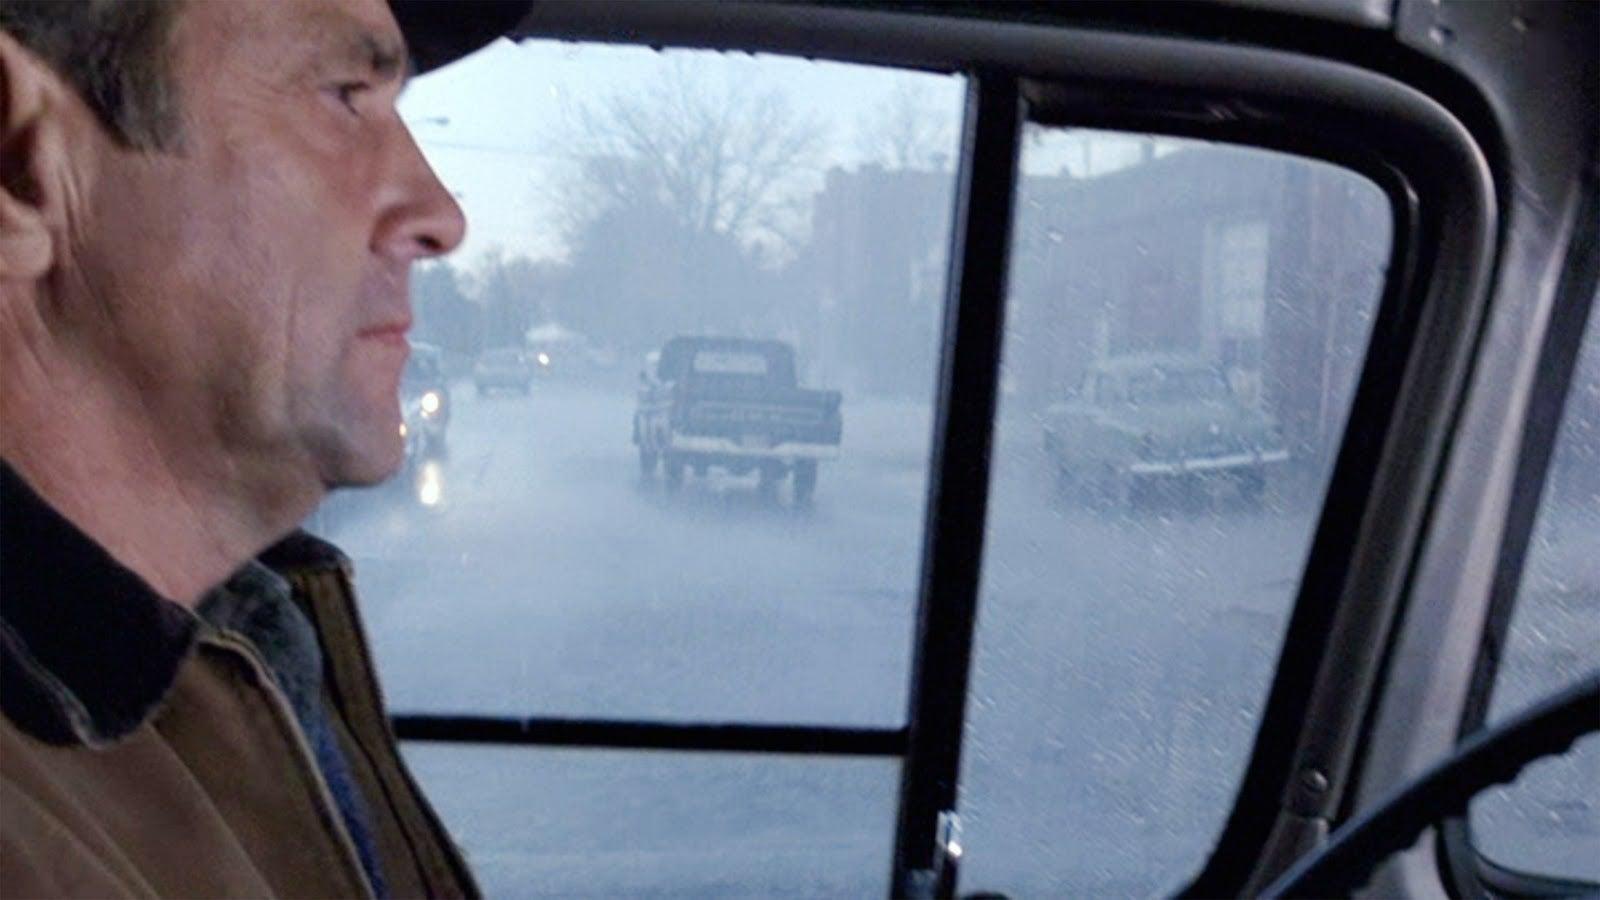 Man in hat sitting in a pickup truck